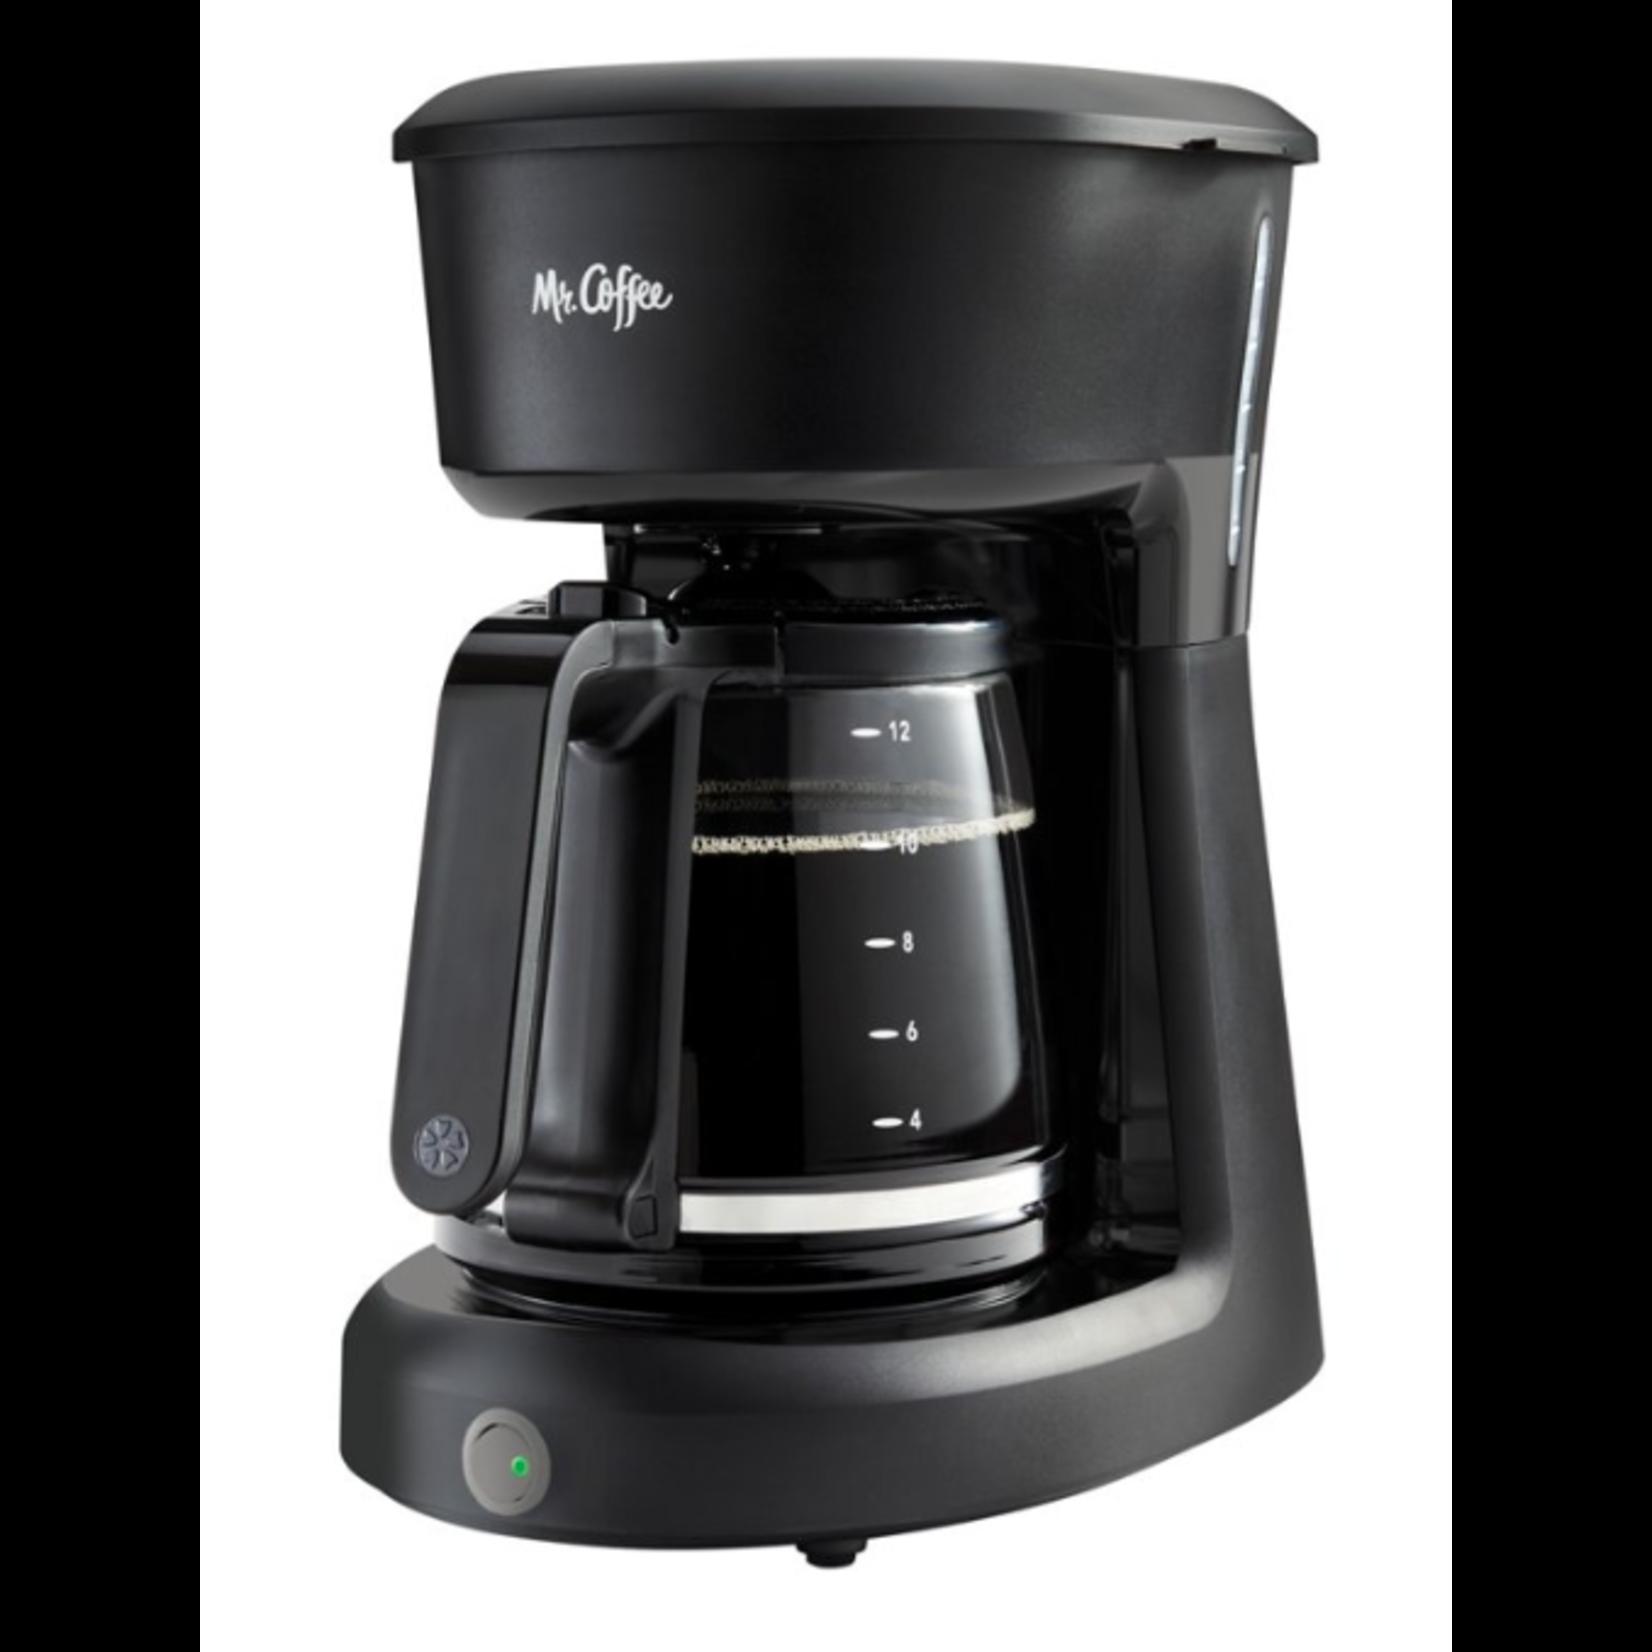 10375 Mr. Coffee Coffee Maker